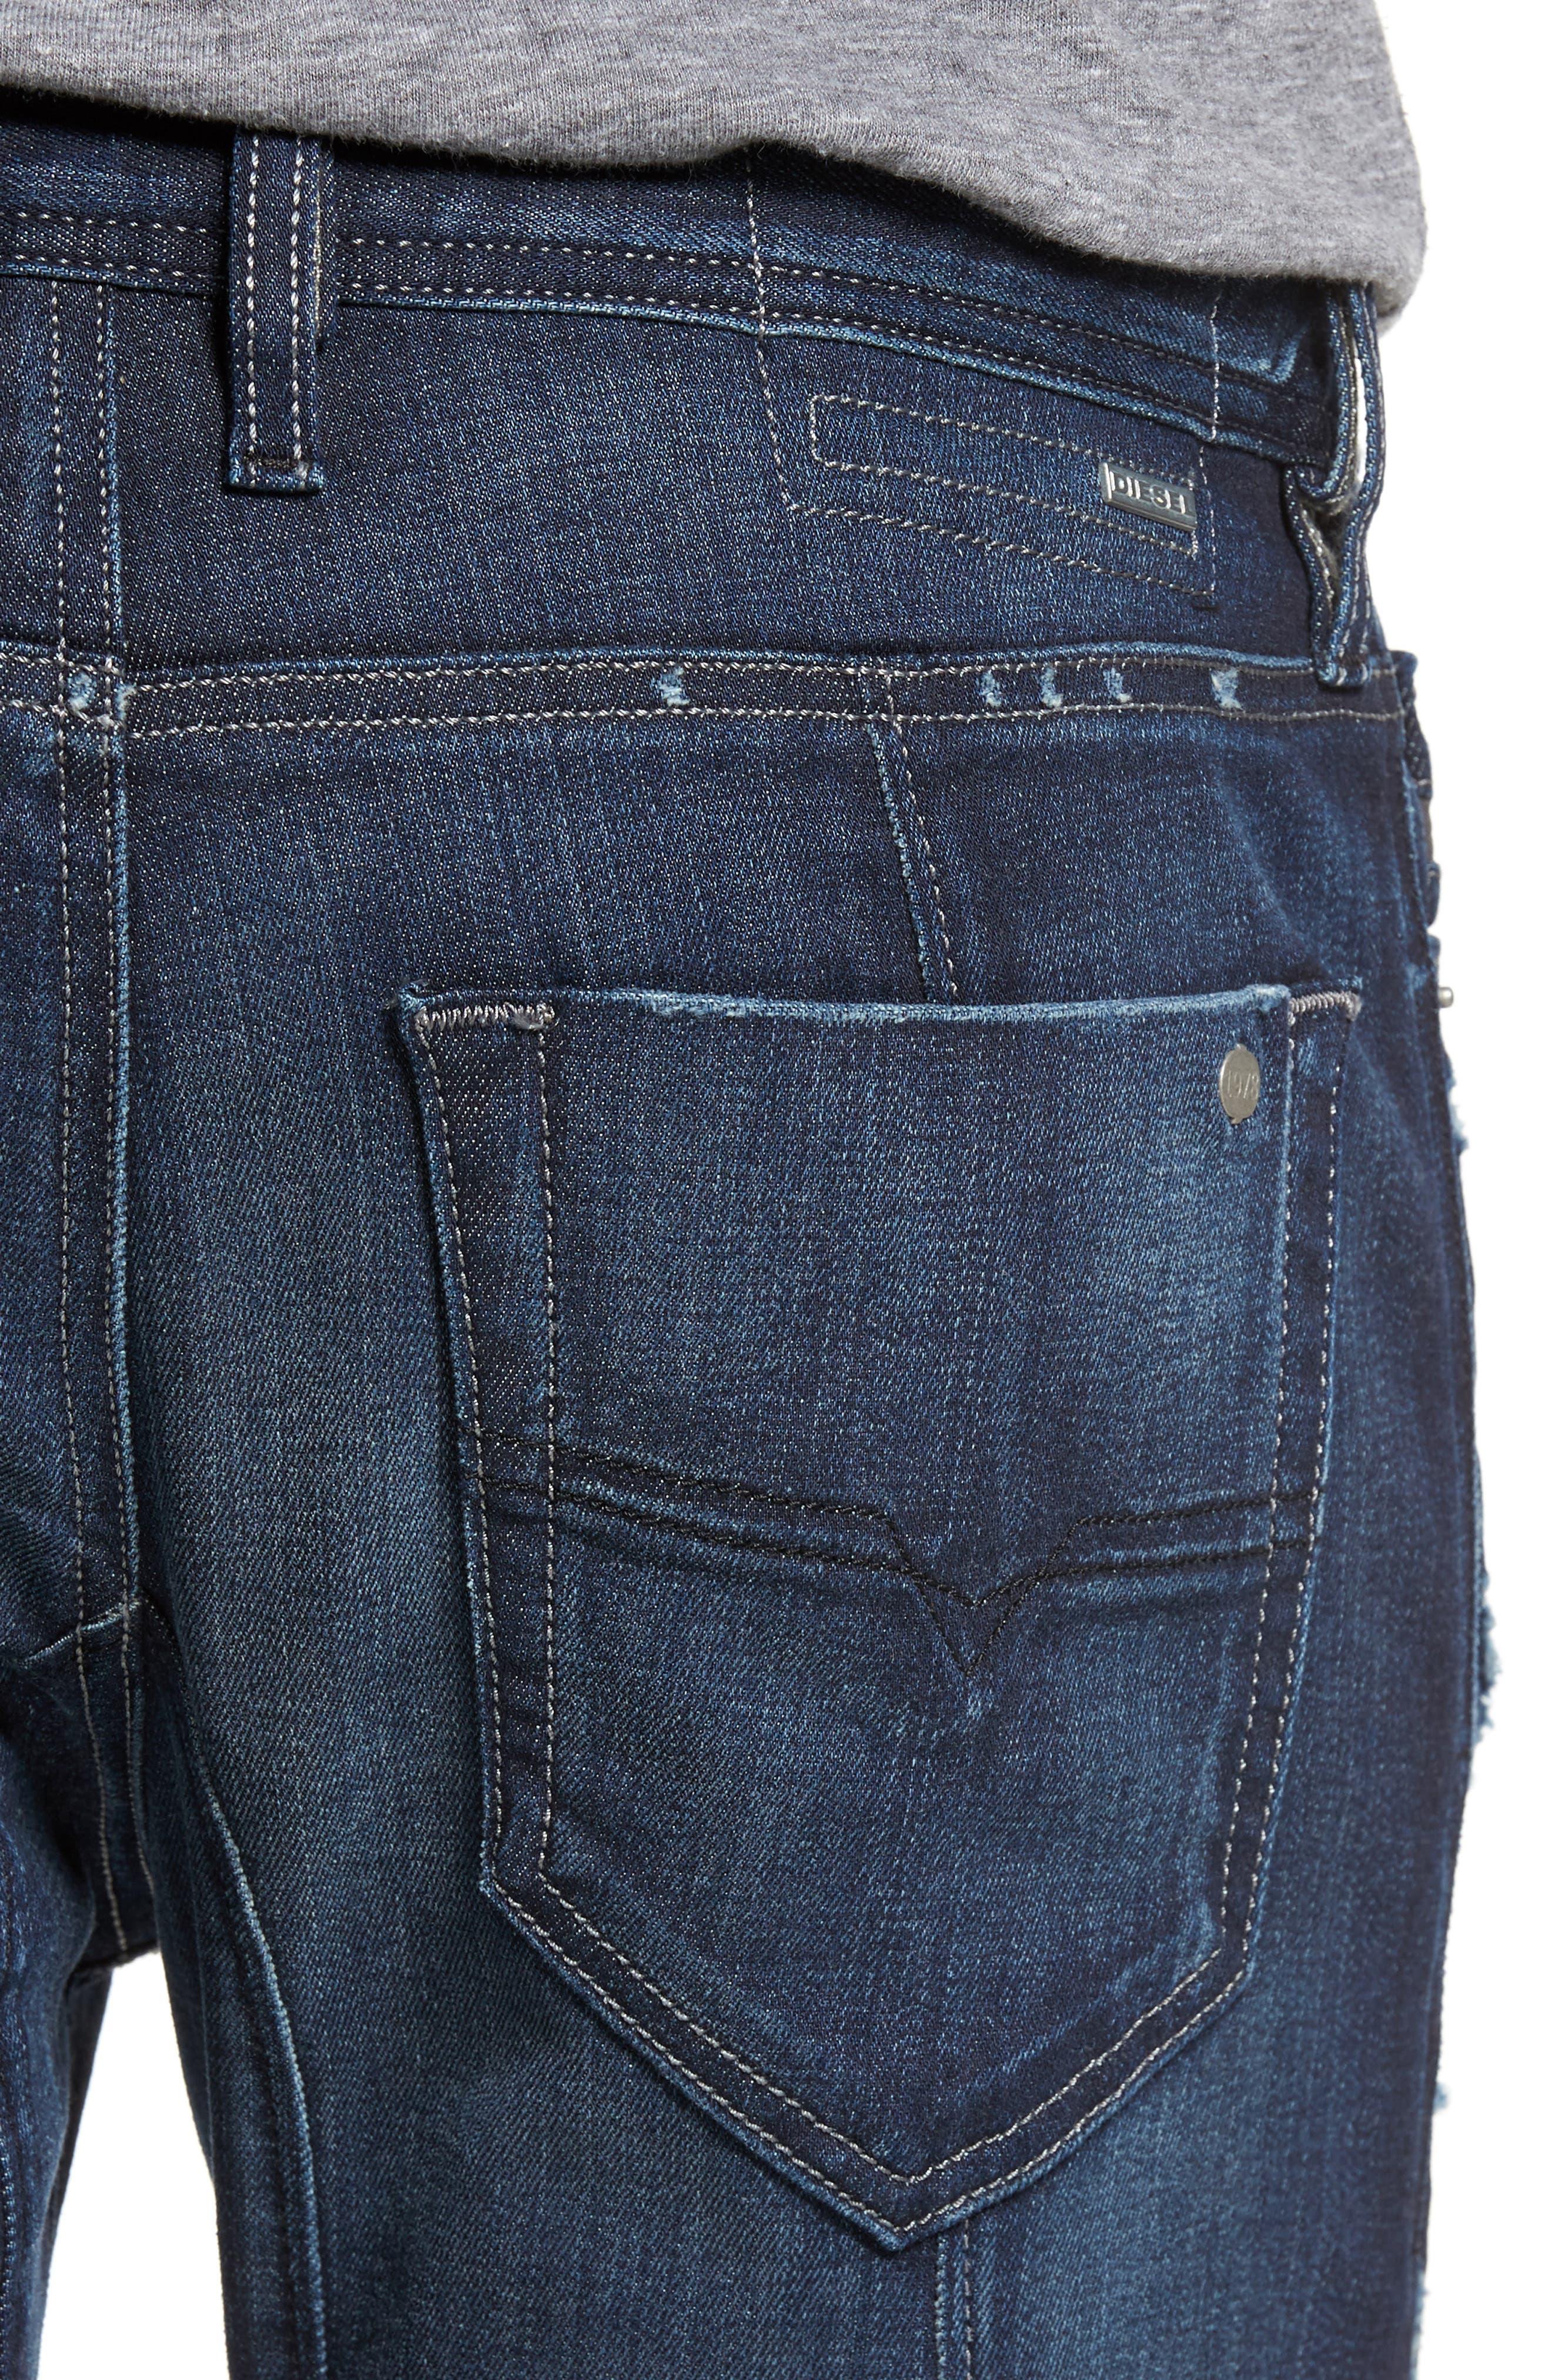 T-Ride Skinny Fit Moto Jeans,                             Alternate thumbnail 4, color,                             400